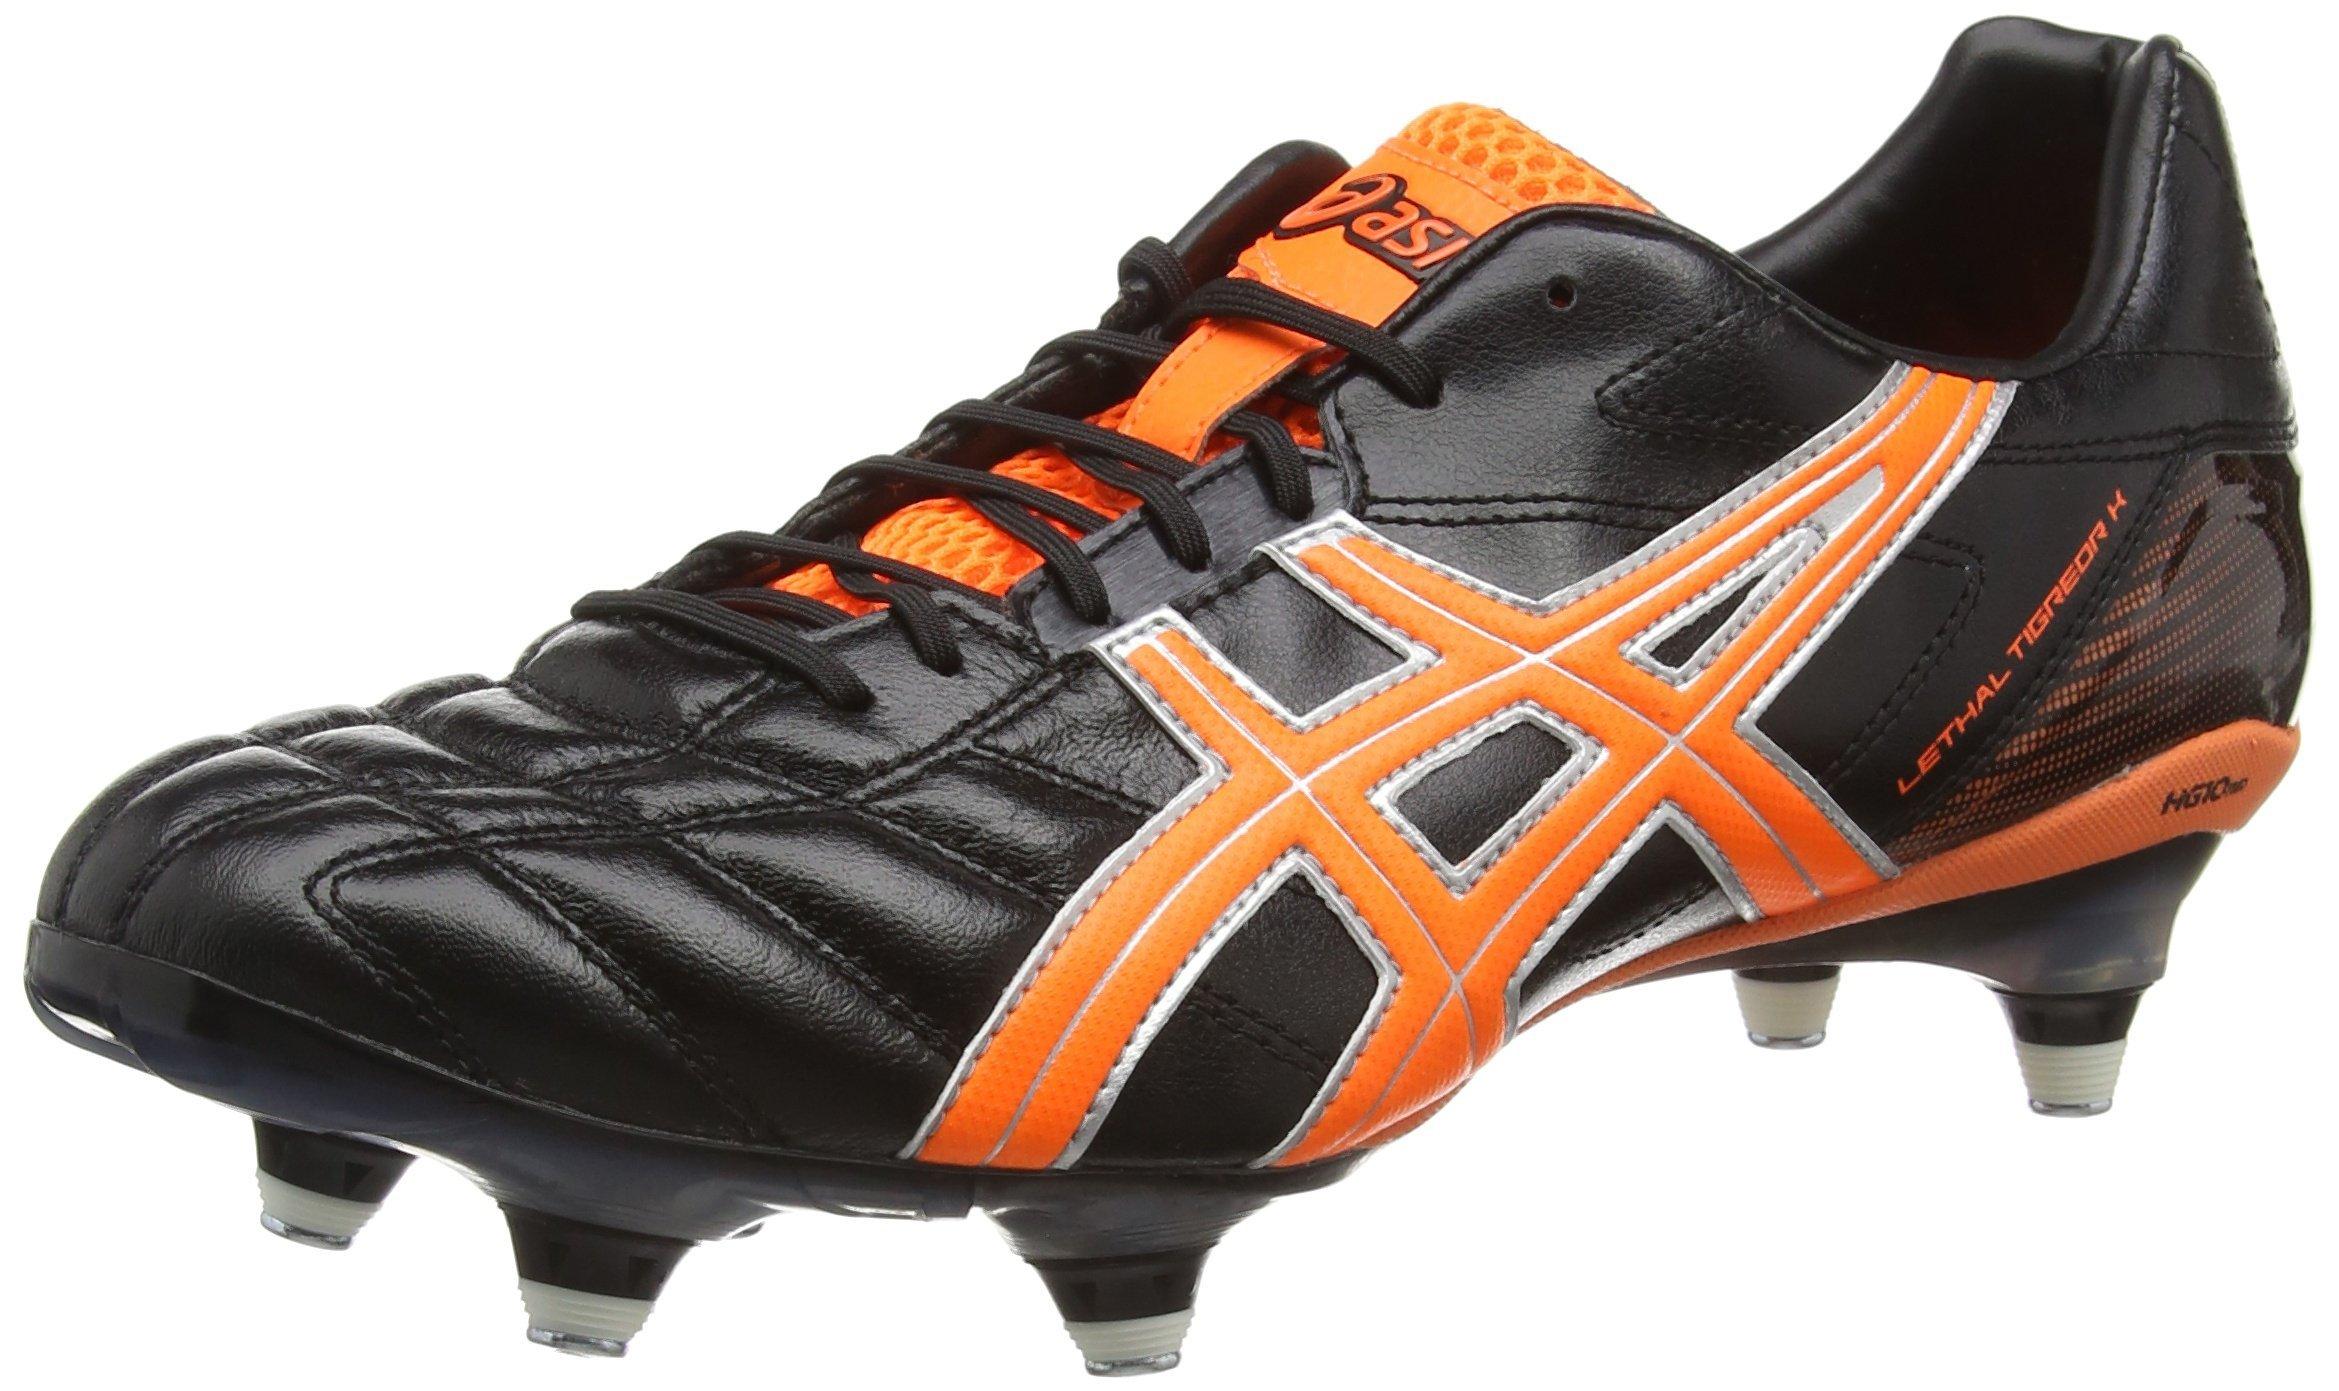 ASICS LETHAL TIGREOR 7 K ST Rugby Boots - 9.5 - Black